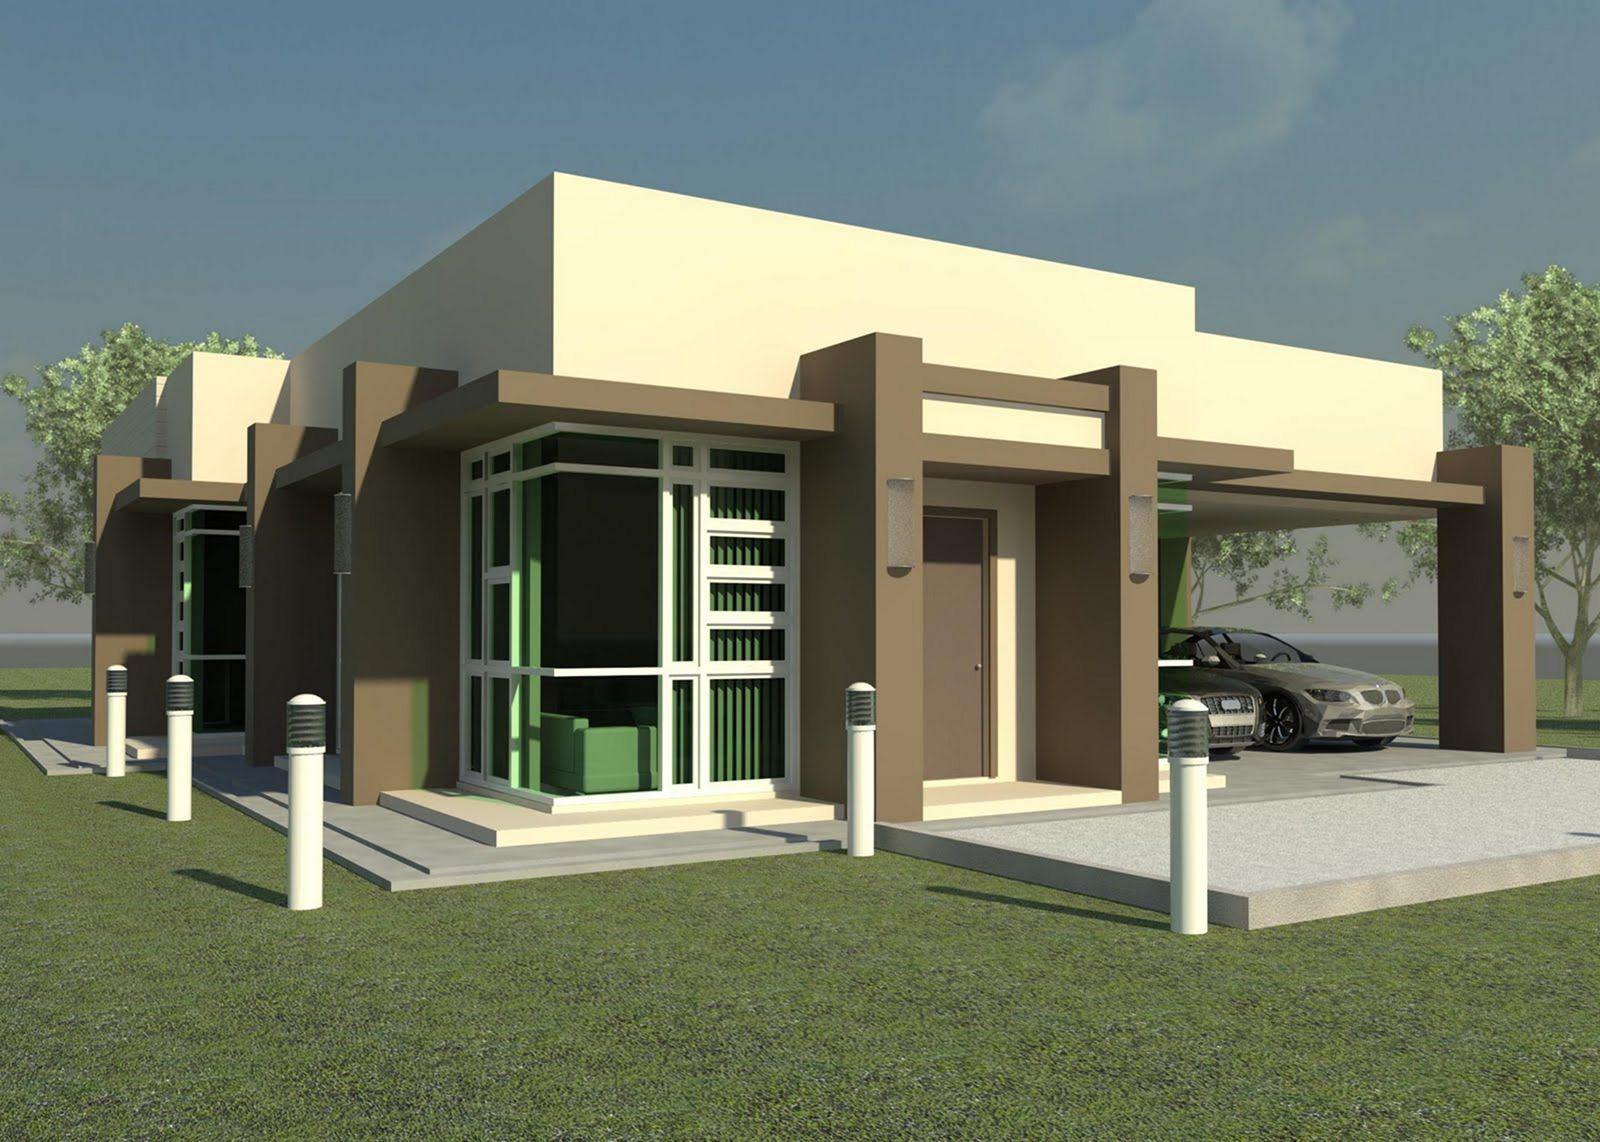 Best 20 Modern Small House Design For Inspiration Modern Small House Design Small House Exteriors Contemporary House Design